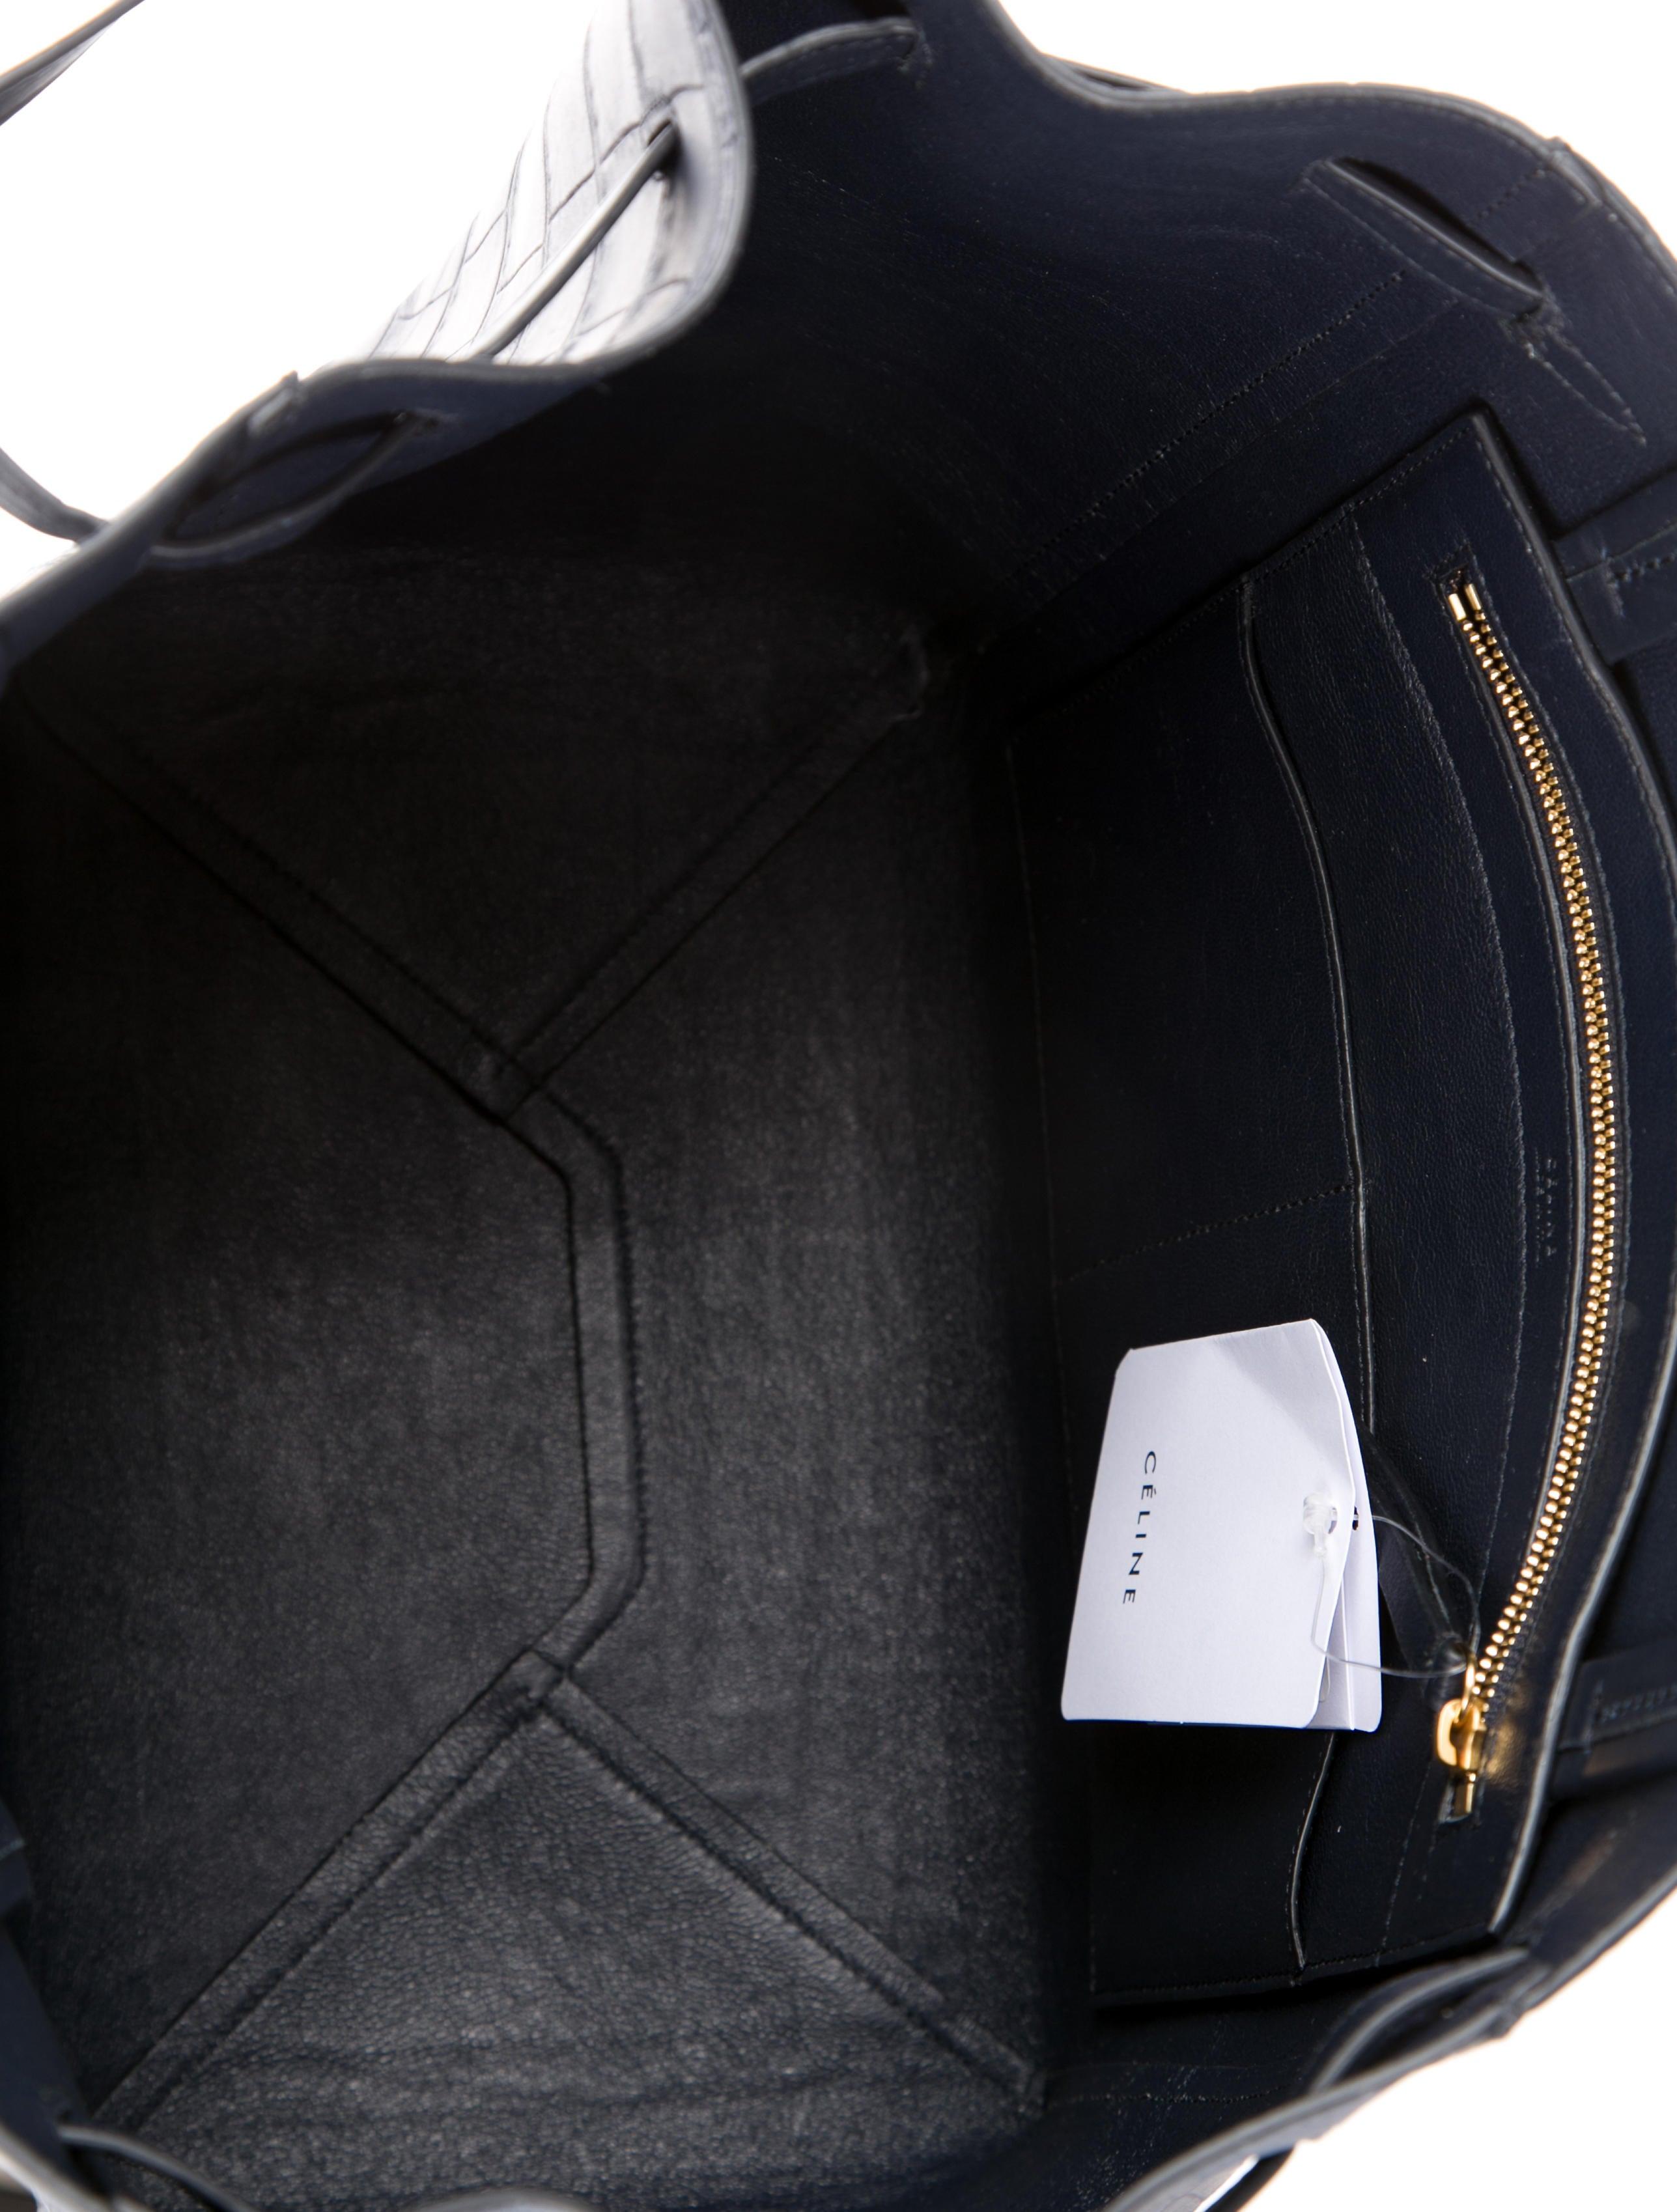 C��line Phantom Cabas Tote w/ Tags - Handbags - CEL32712 | The RealReal